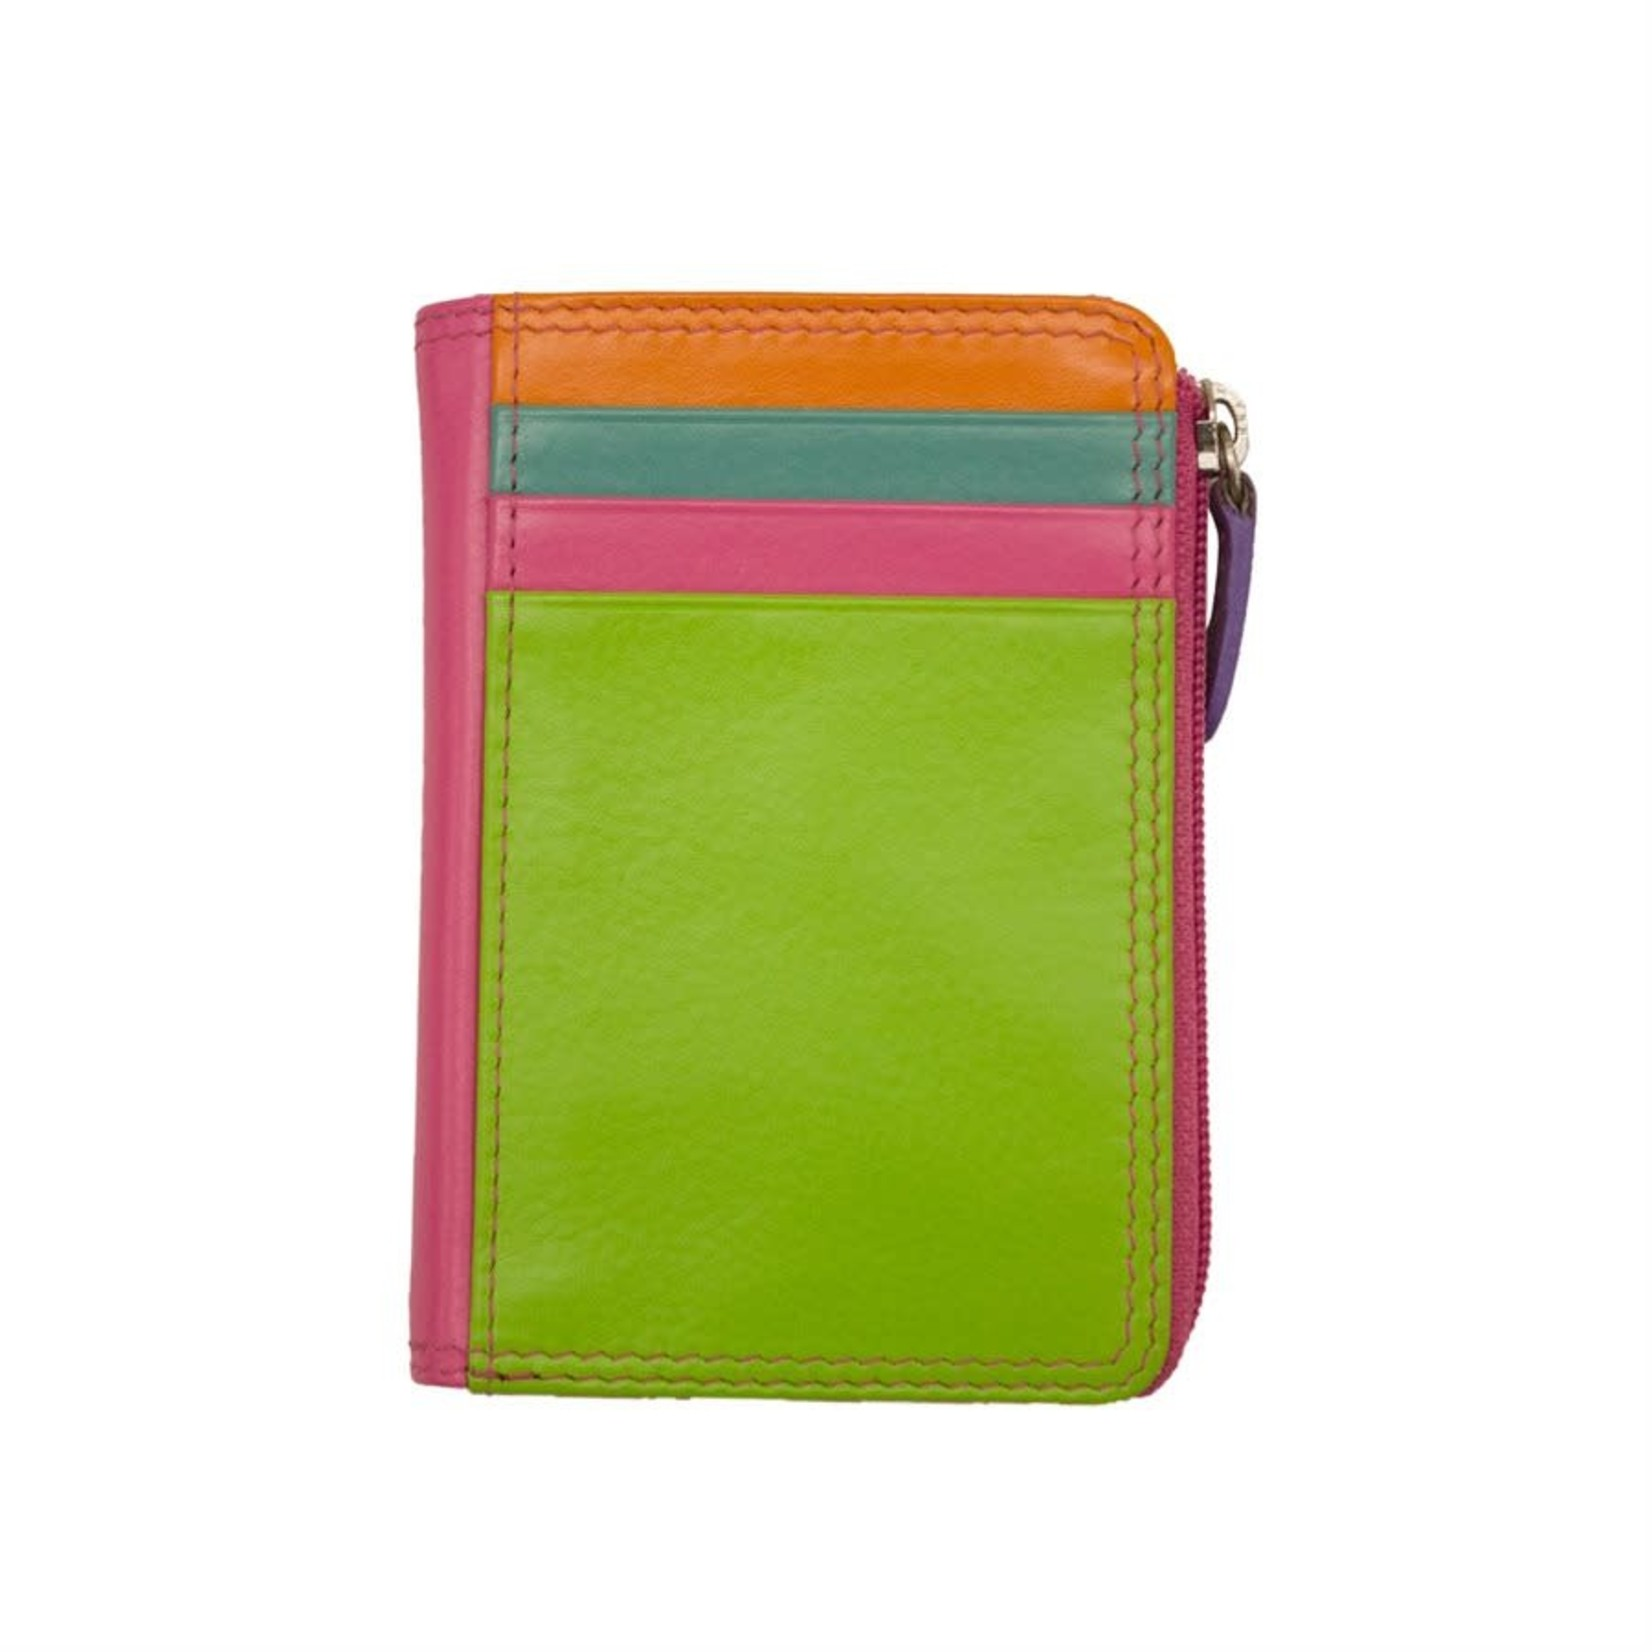 Leather Handbags and Accessories 7411 Palm Beach - RFID CC ID Holder